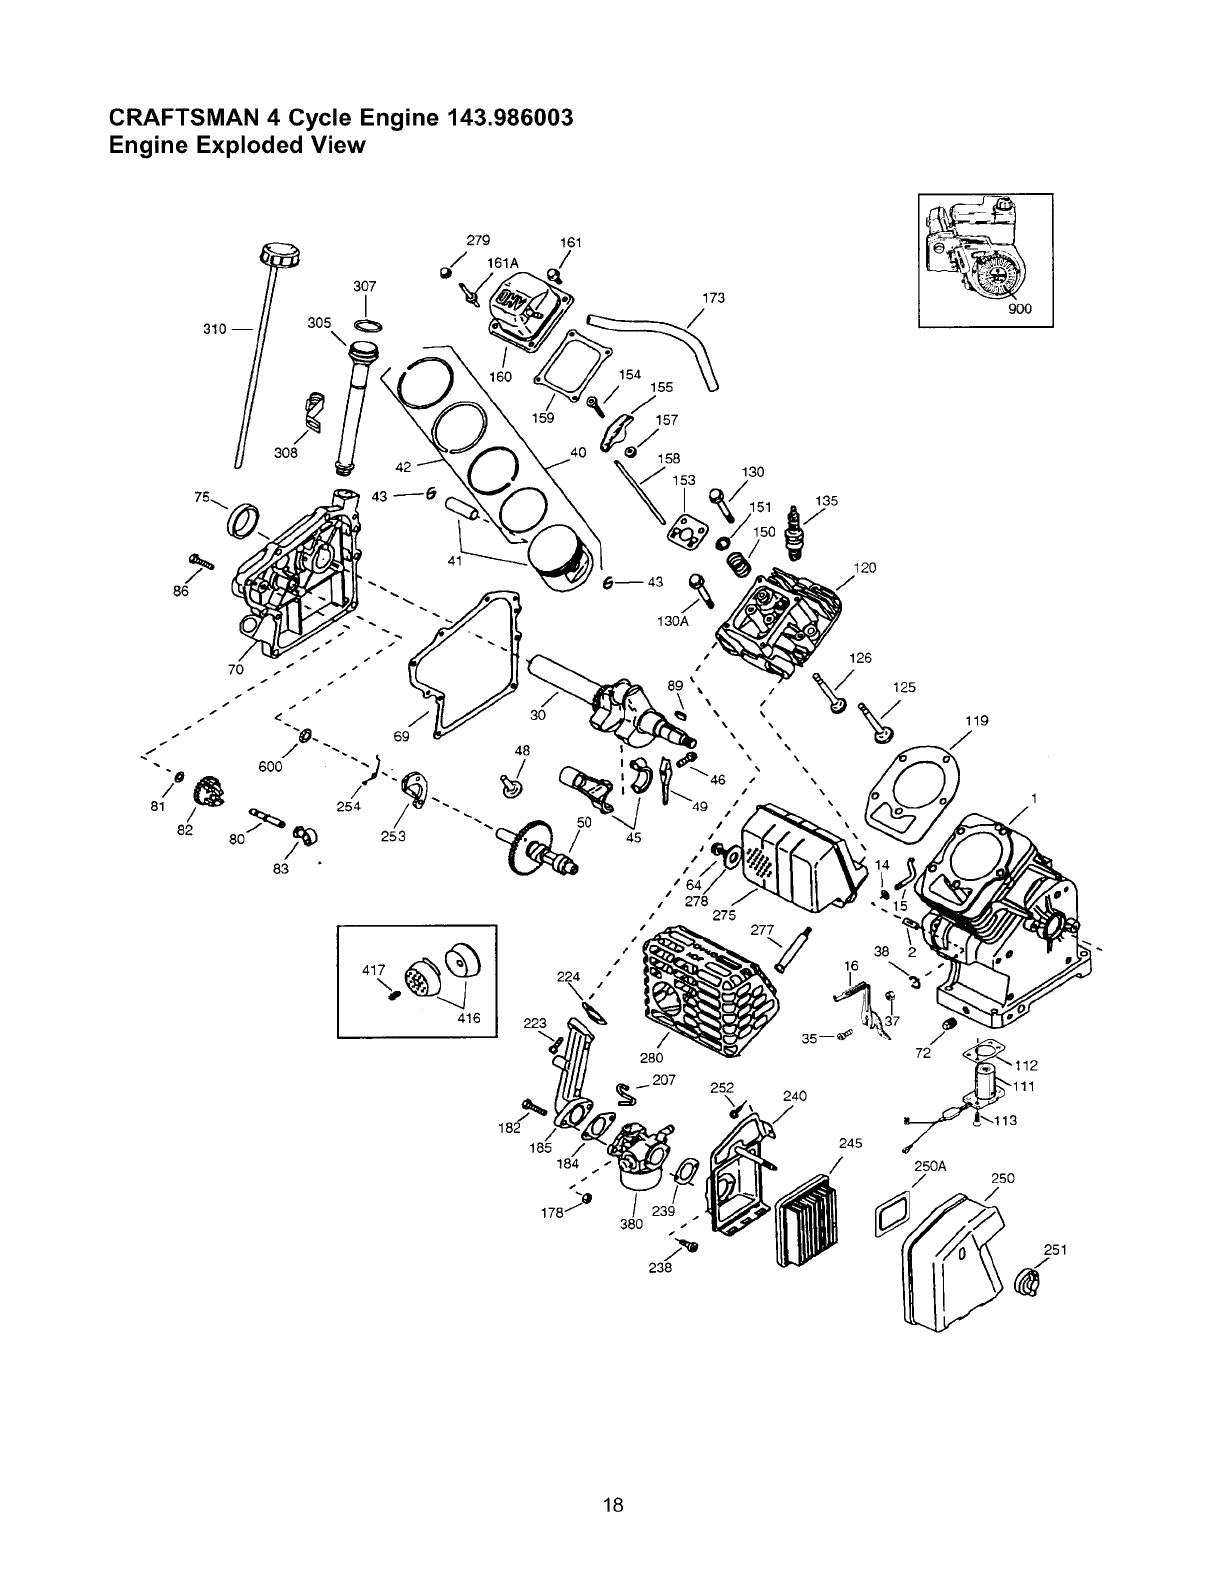 Craftsman 4 cycle engine 143 986003